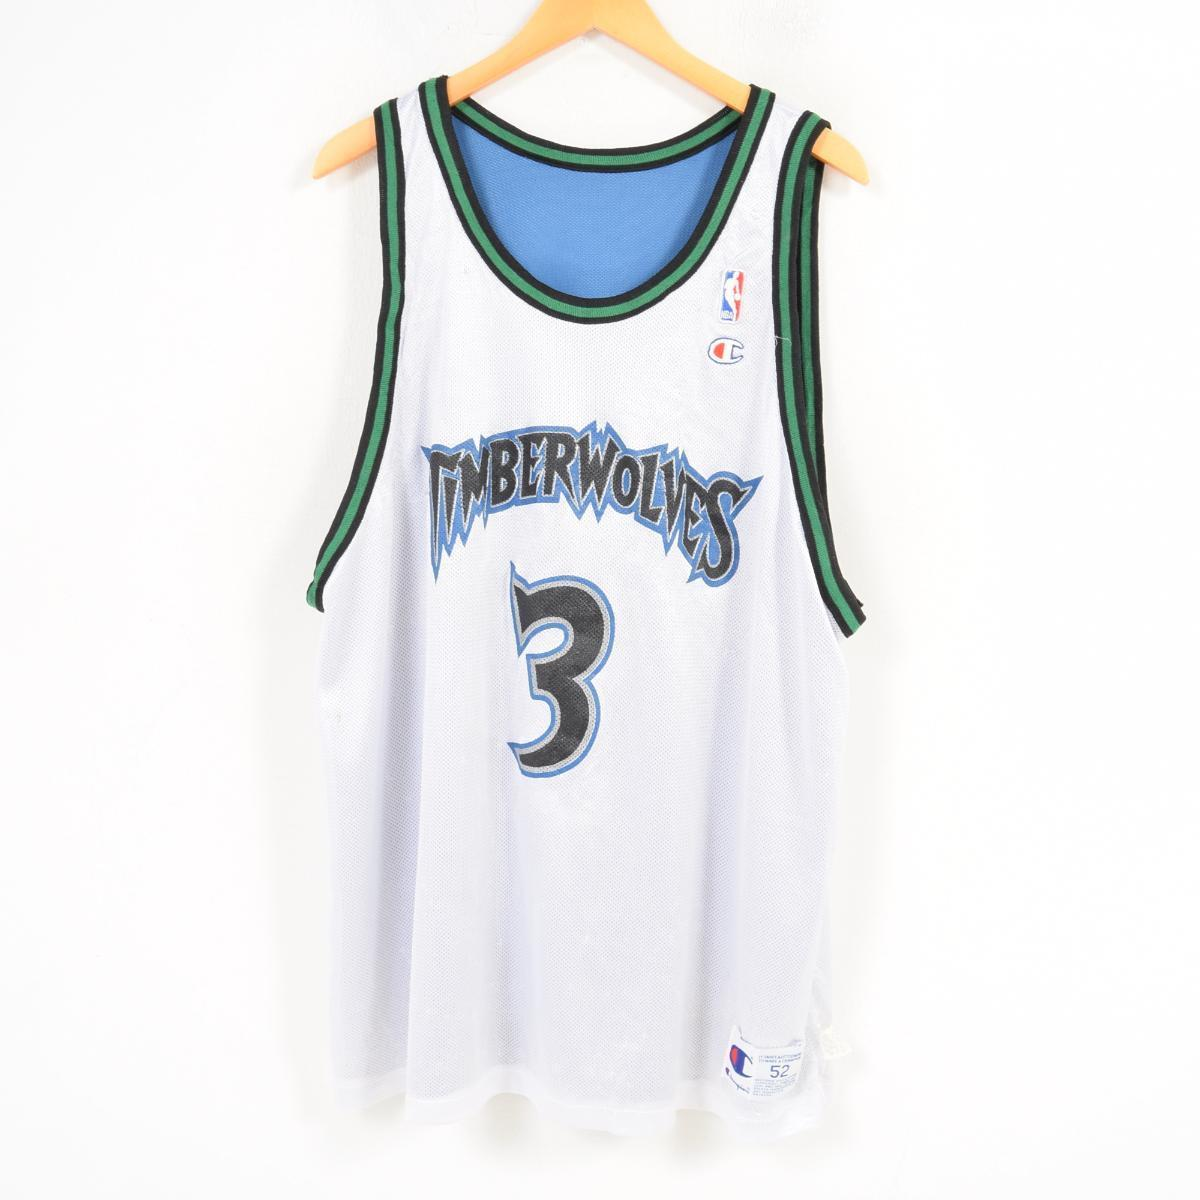 0247bbef5bb Champion Champion NBA MINNESOTA TIMBERWOLVES Minnesota Timberwolves STEPHON  MARBURY Stephon Marbury game shirt replica uniform men ...